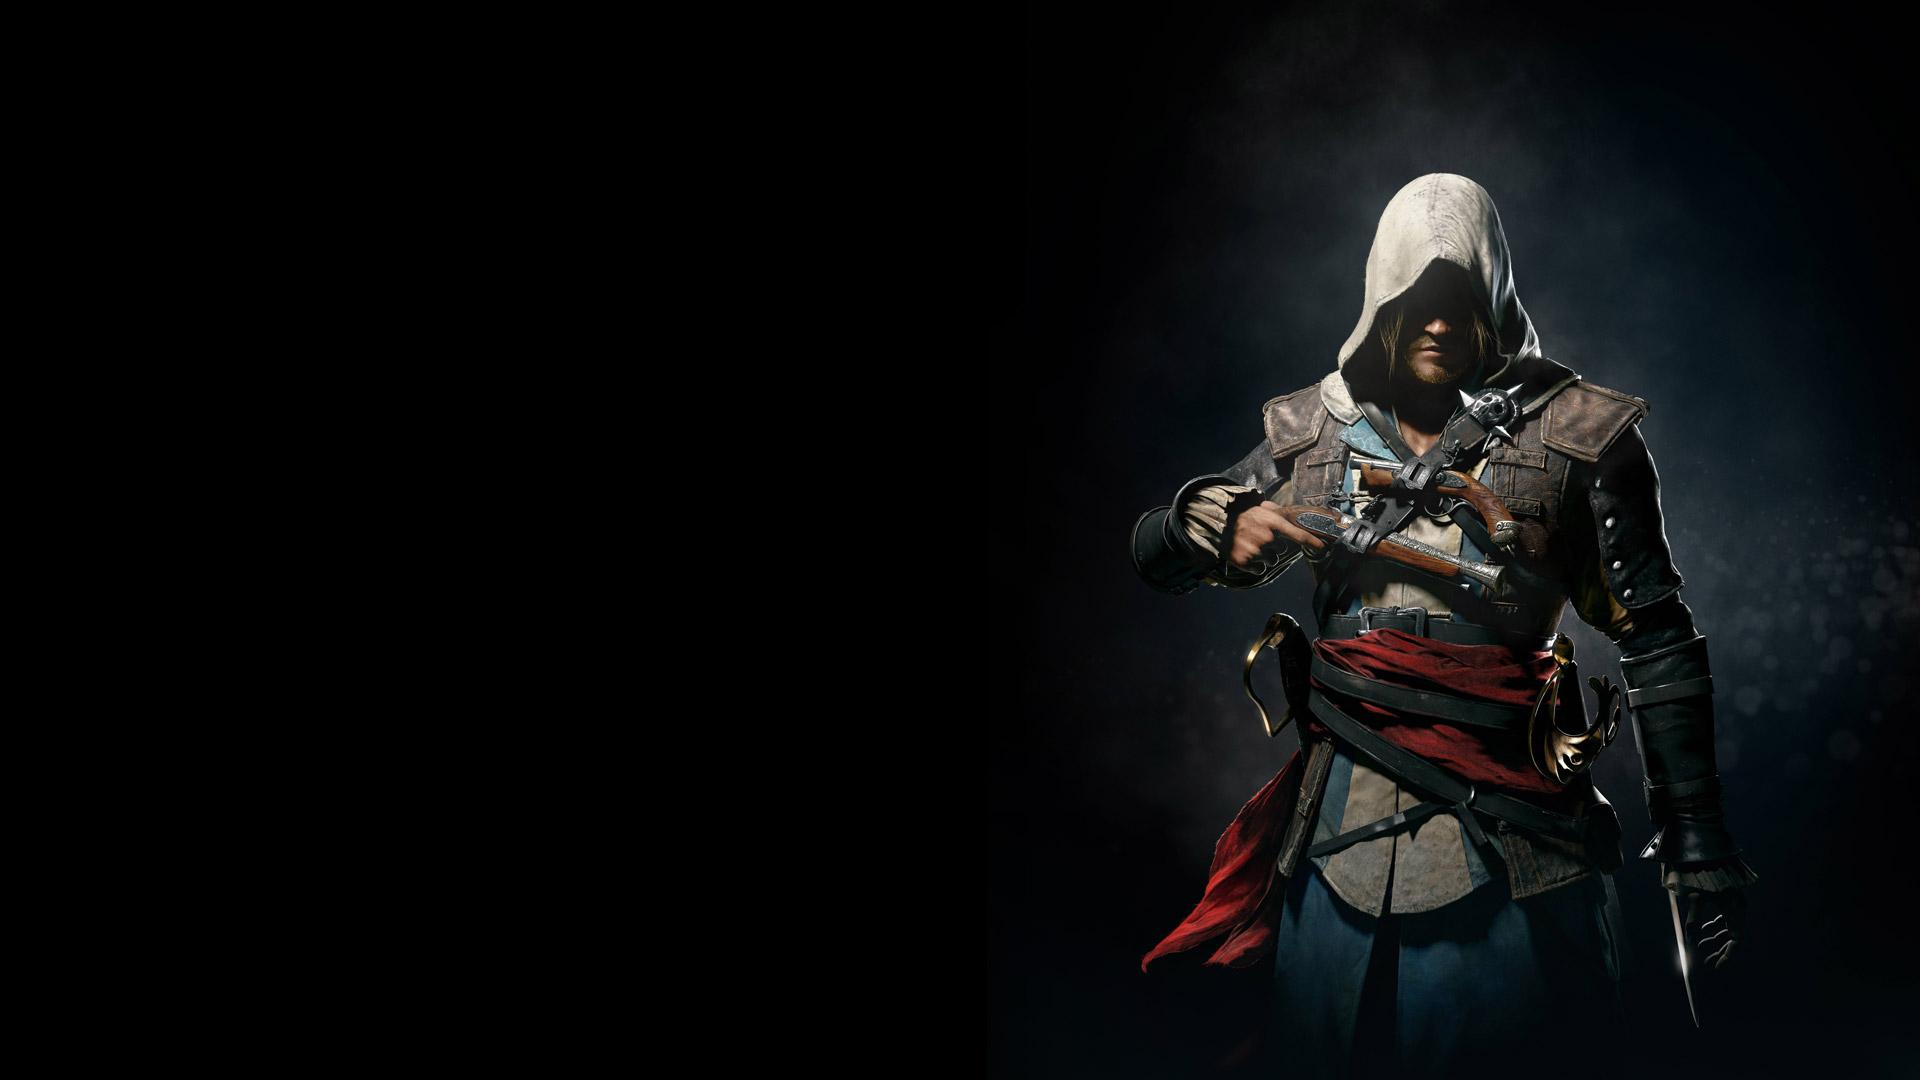 Assassins Creed IV Black Flag Wallpaper in 1920x1080 1920x1080